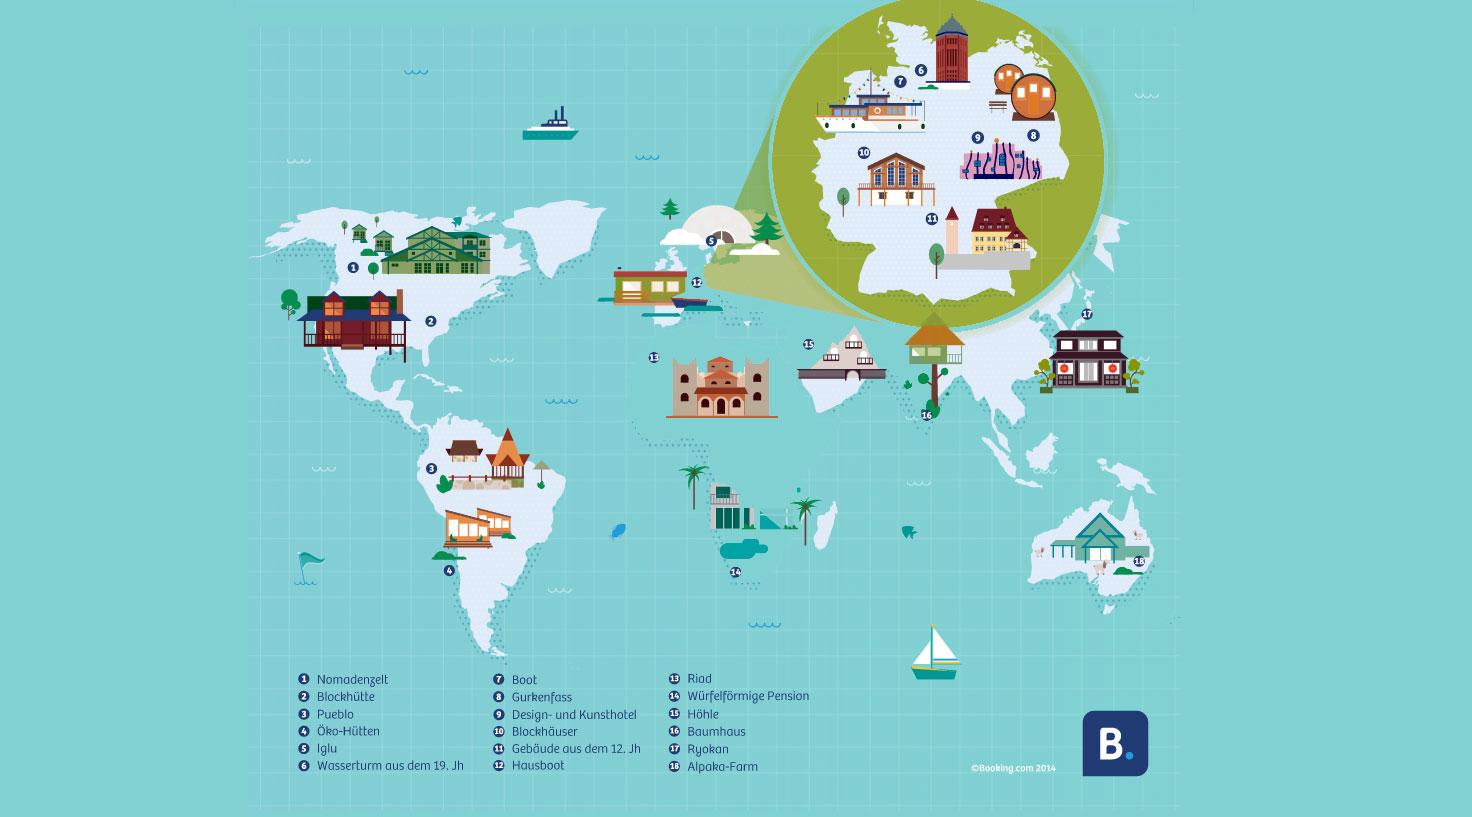 Epic Accommodations around the world